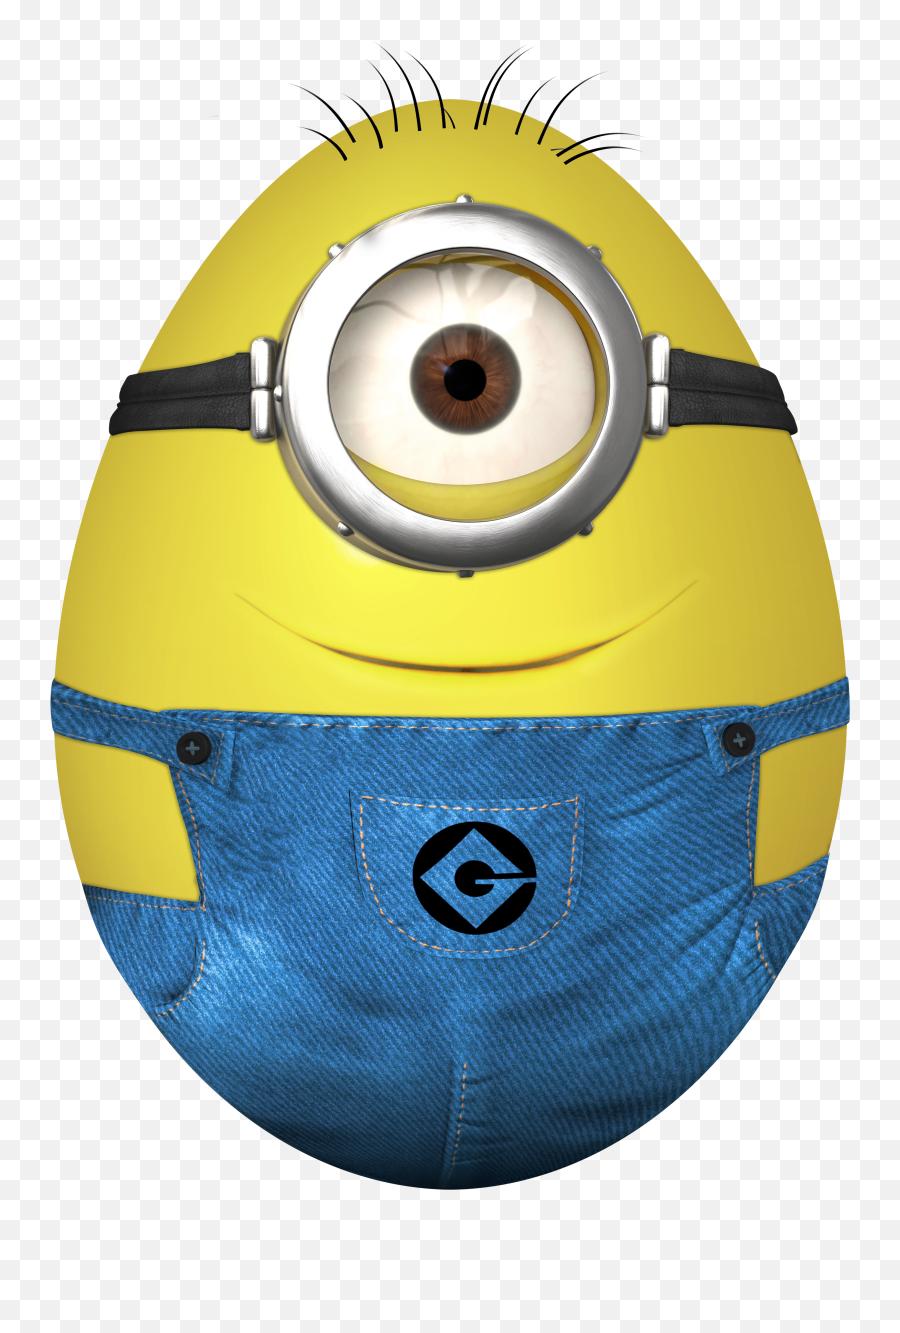 Cliparts Download Free Clip Art - Easter Egg Minion Emoji,Minion Emoji Keyboard